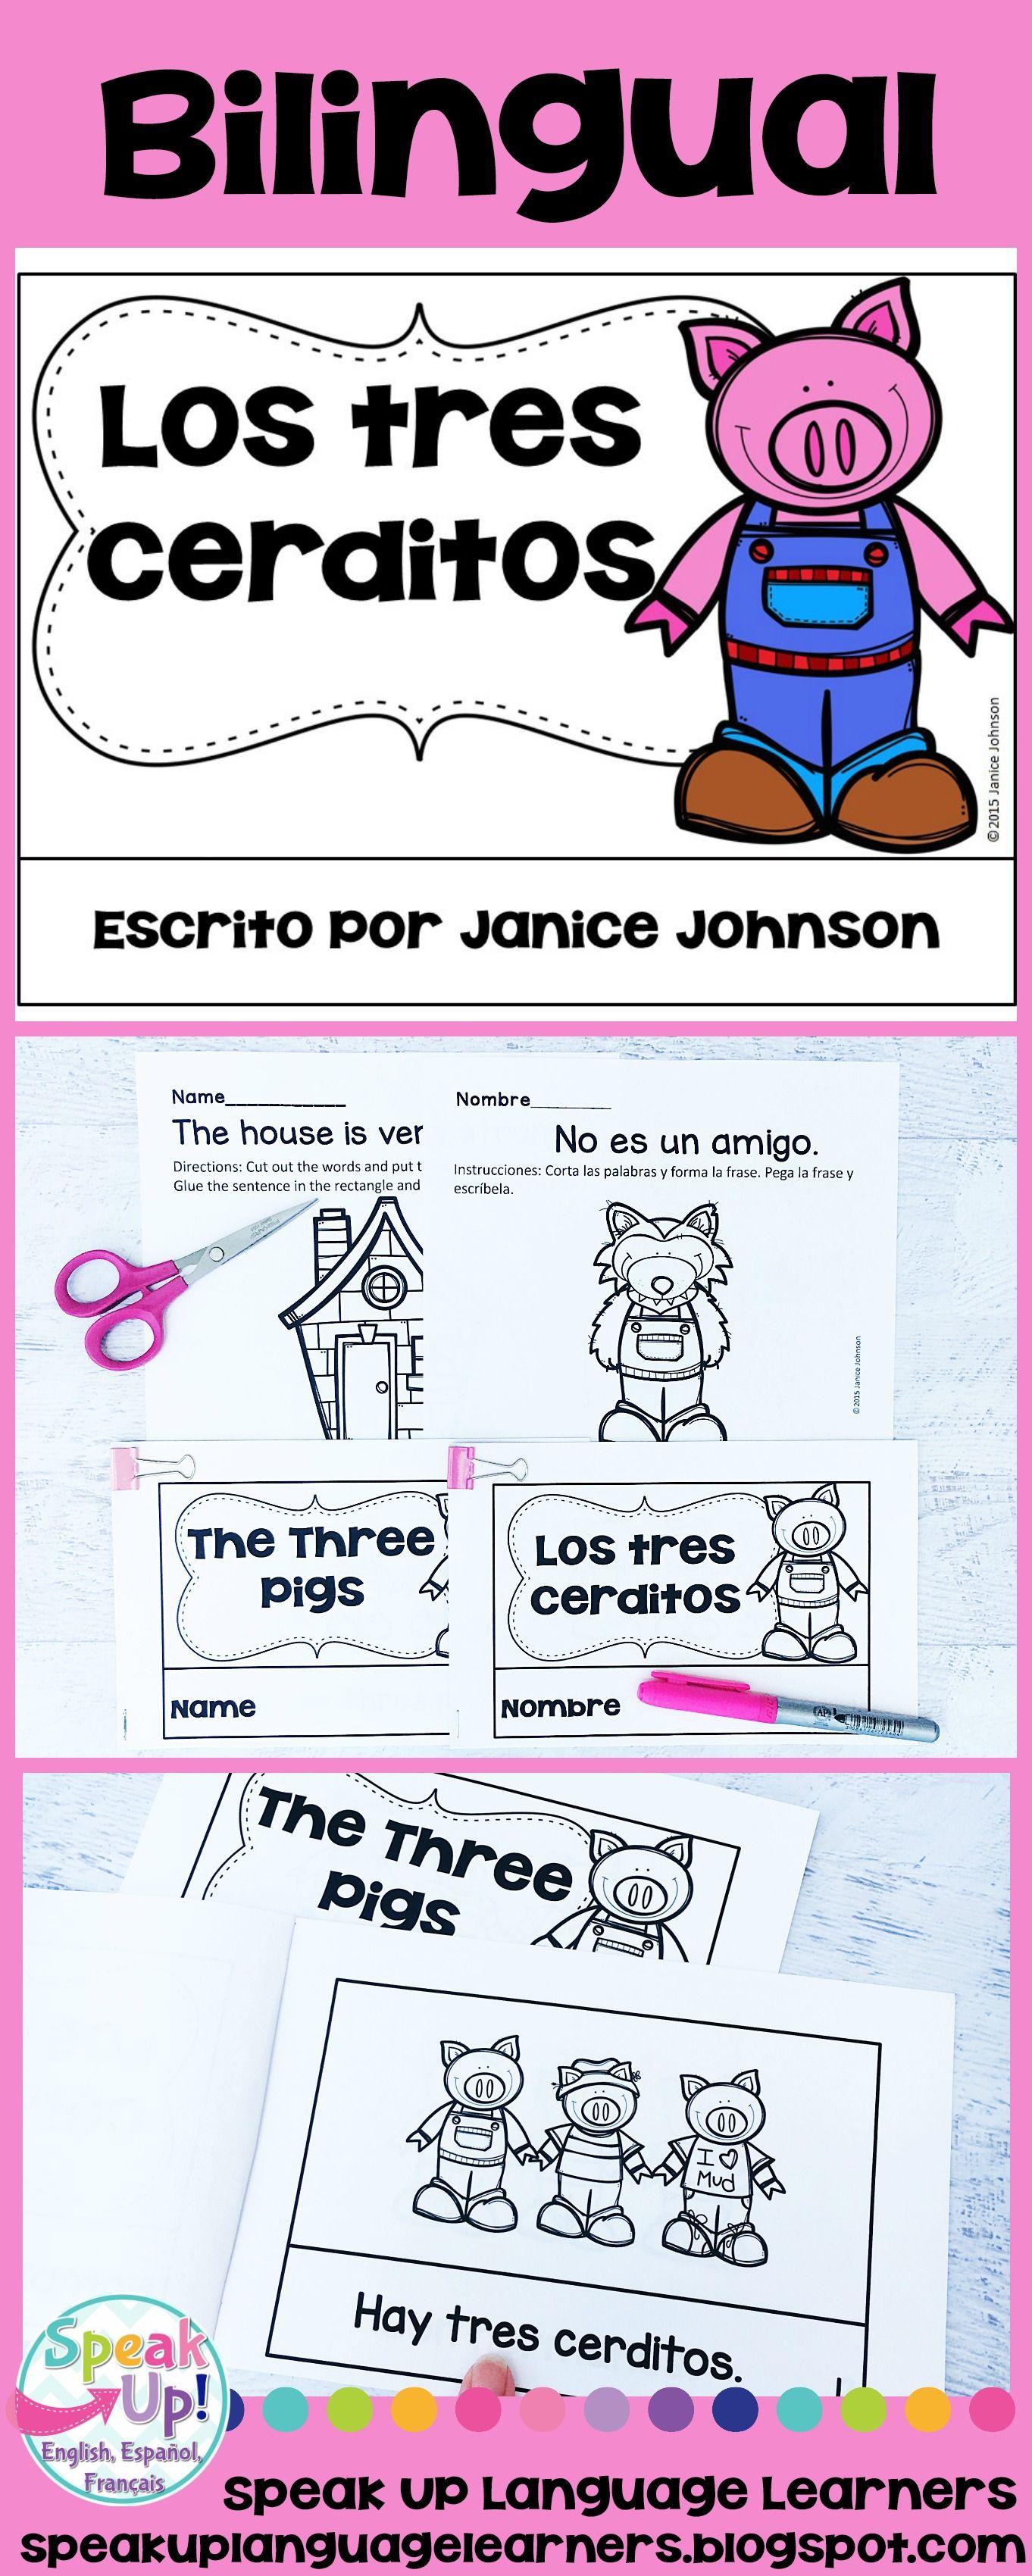 Los Tres Cerditos The Three Pigs Readers Printable Boom Cards Bilingual Bilingual Language Learners Language Teaching [ 3400 x 1362 Pixel ]